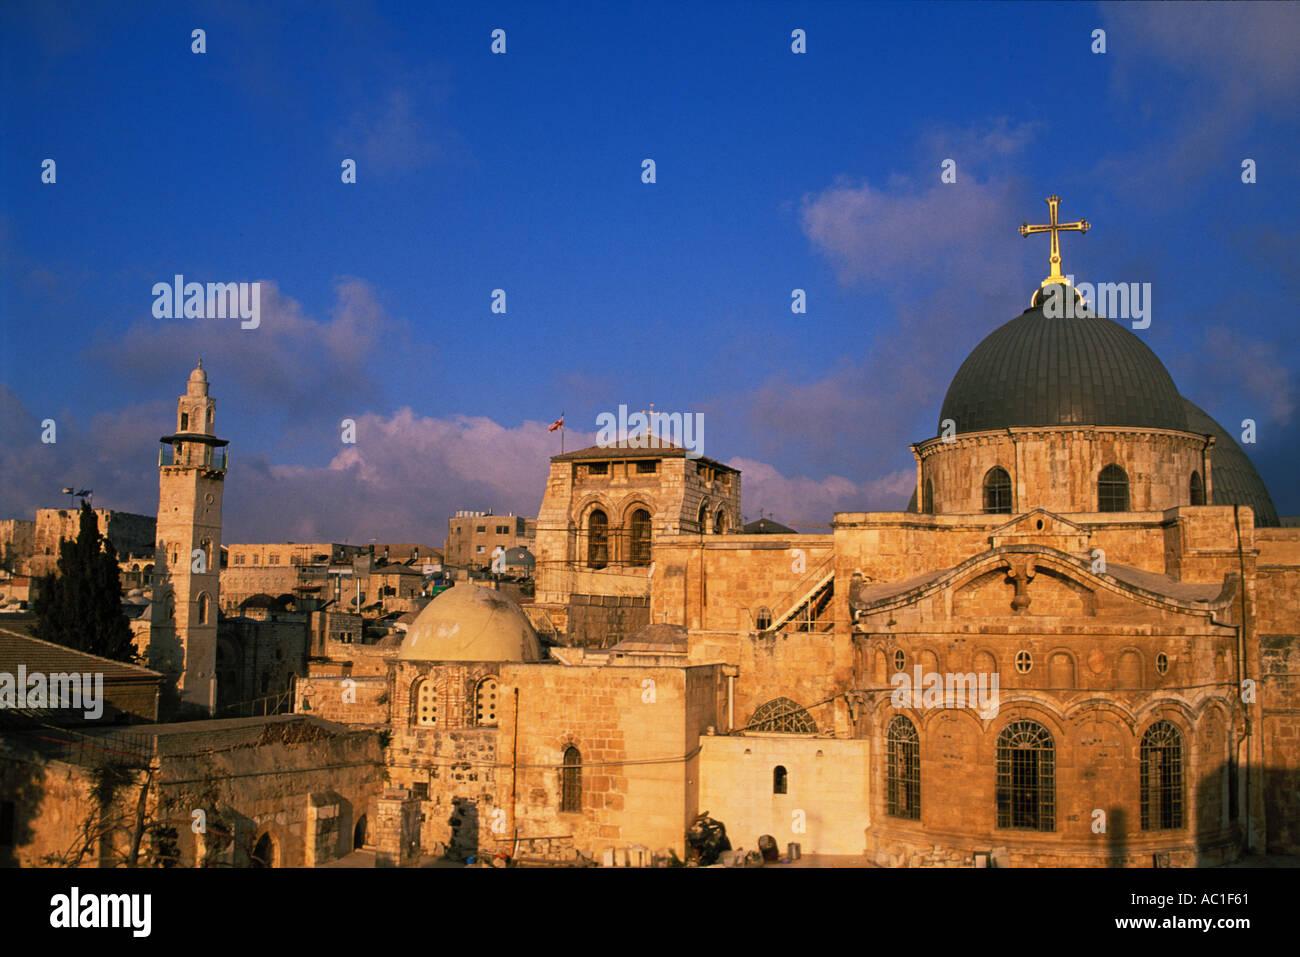 Israel, Jerusalem, Church of Holy Sepulchre - Stock Image